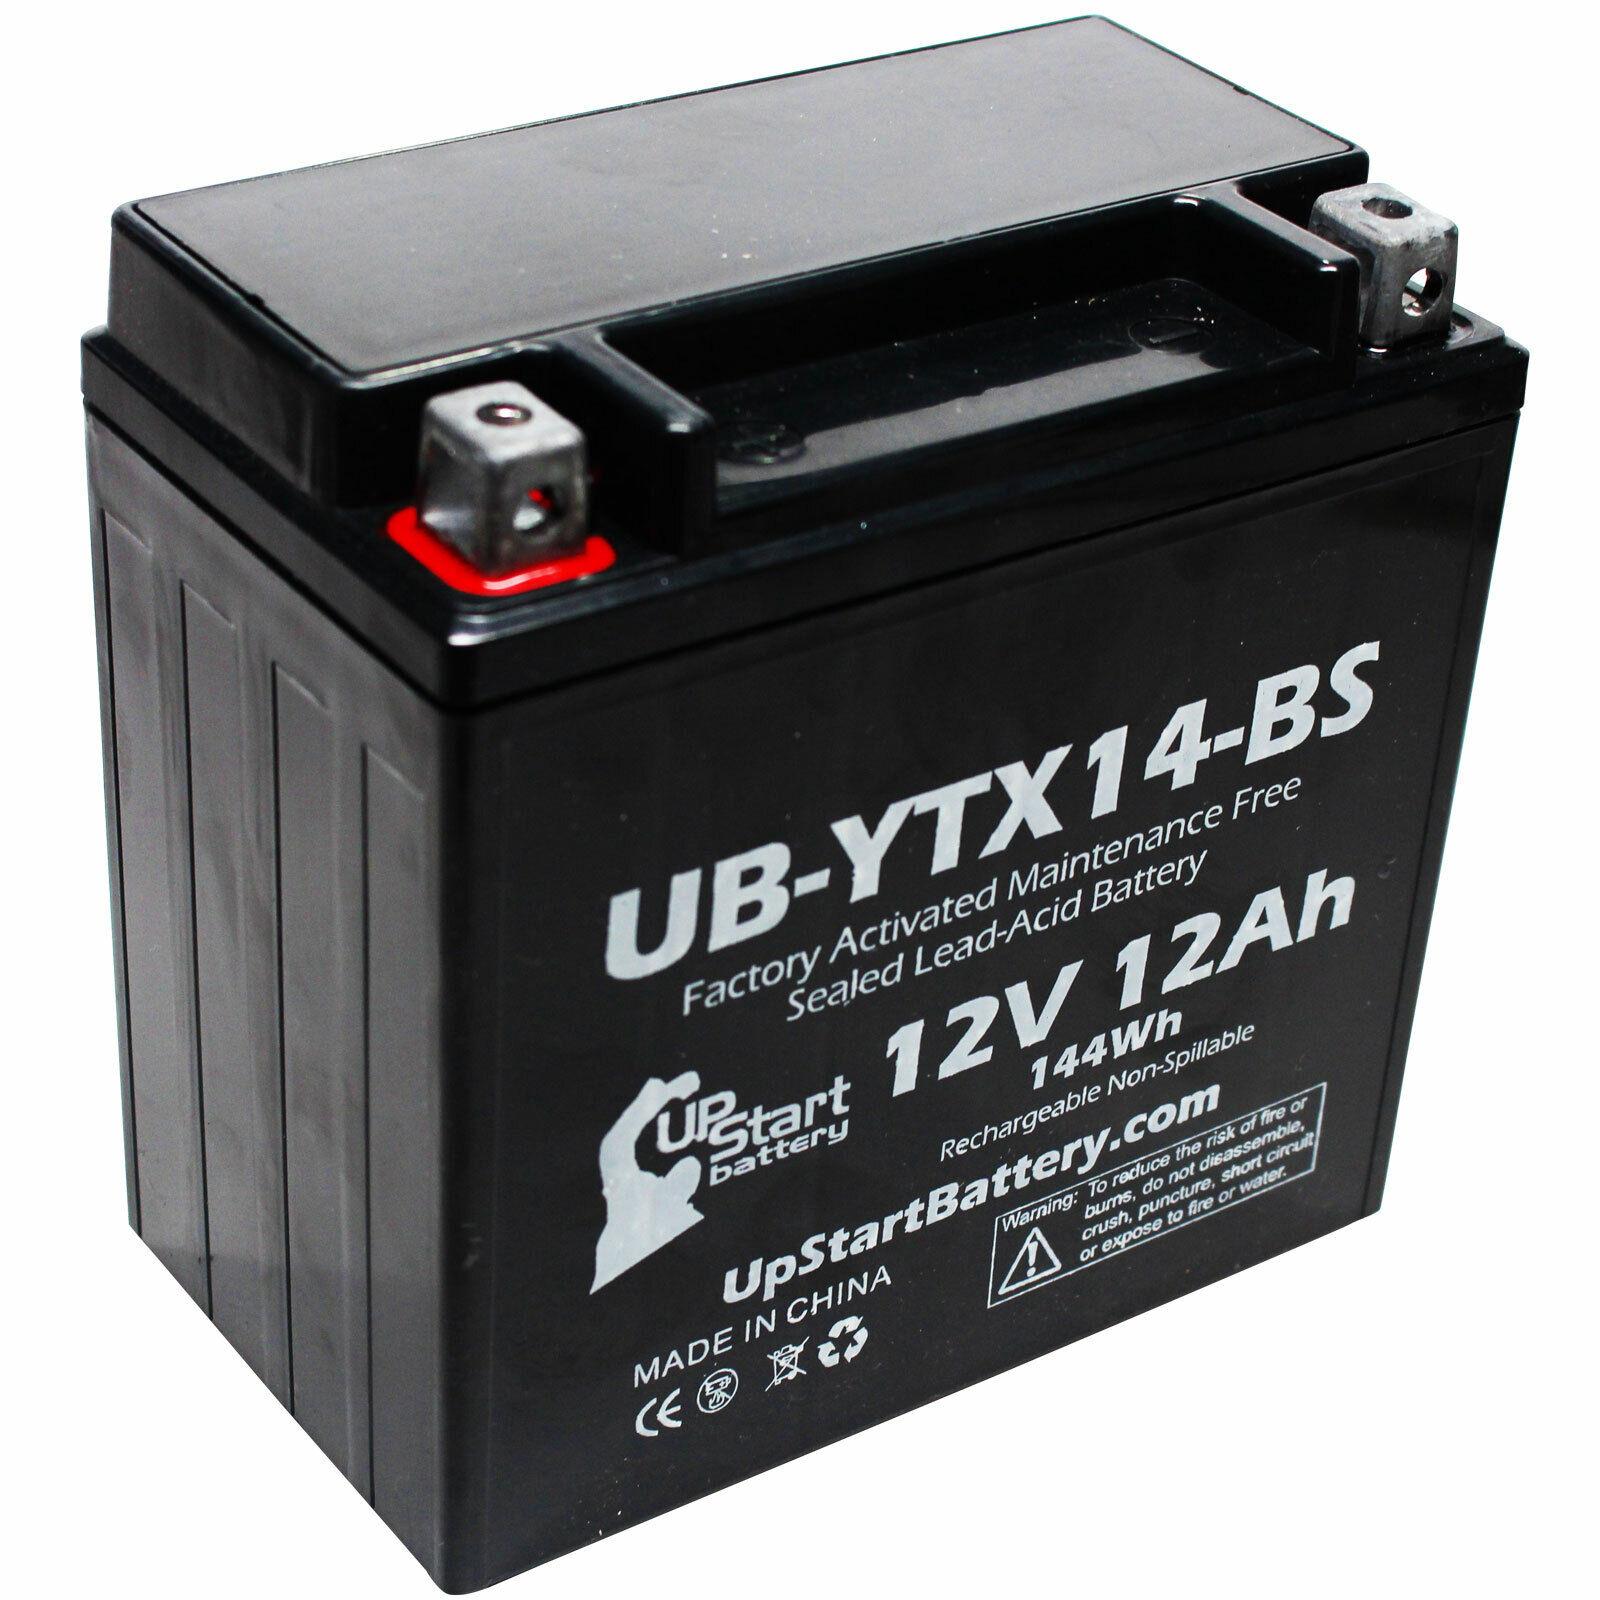 12V 12AH Battery for 2000 Honda TRX300 Fourtrax 300 CC